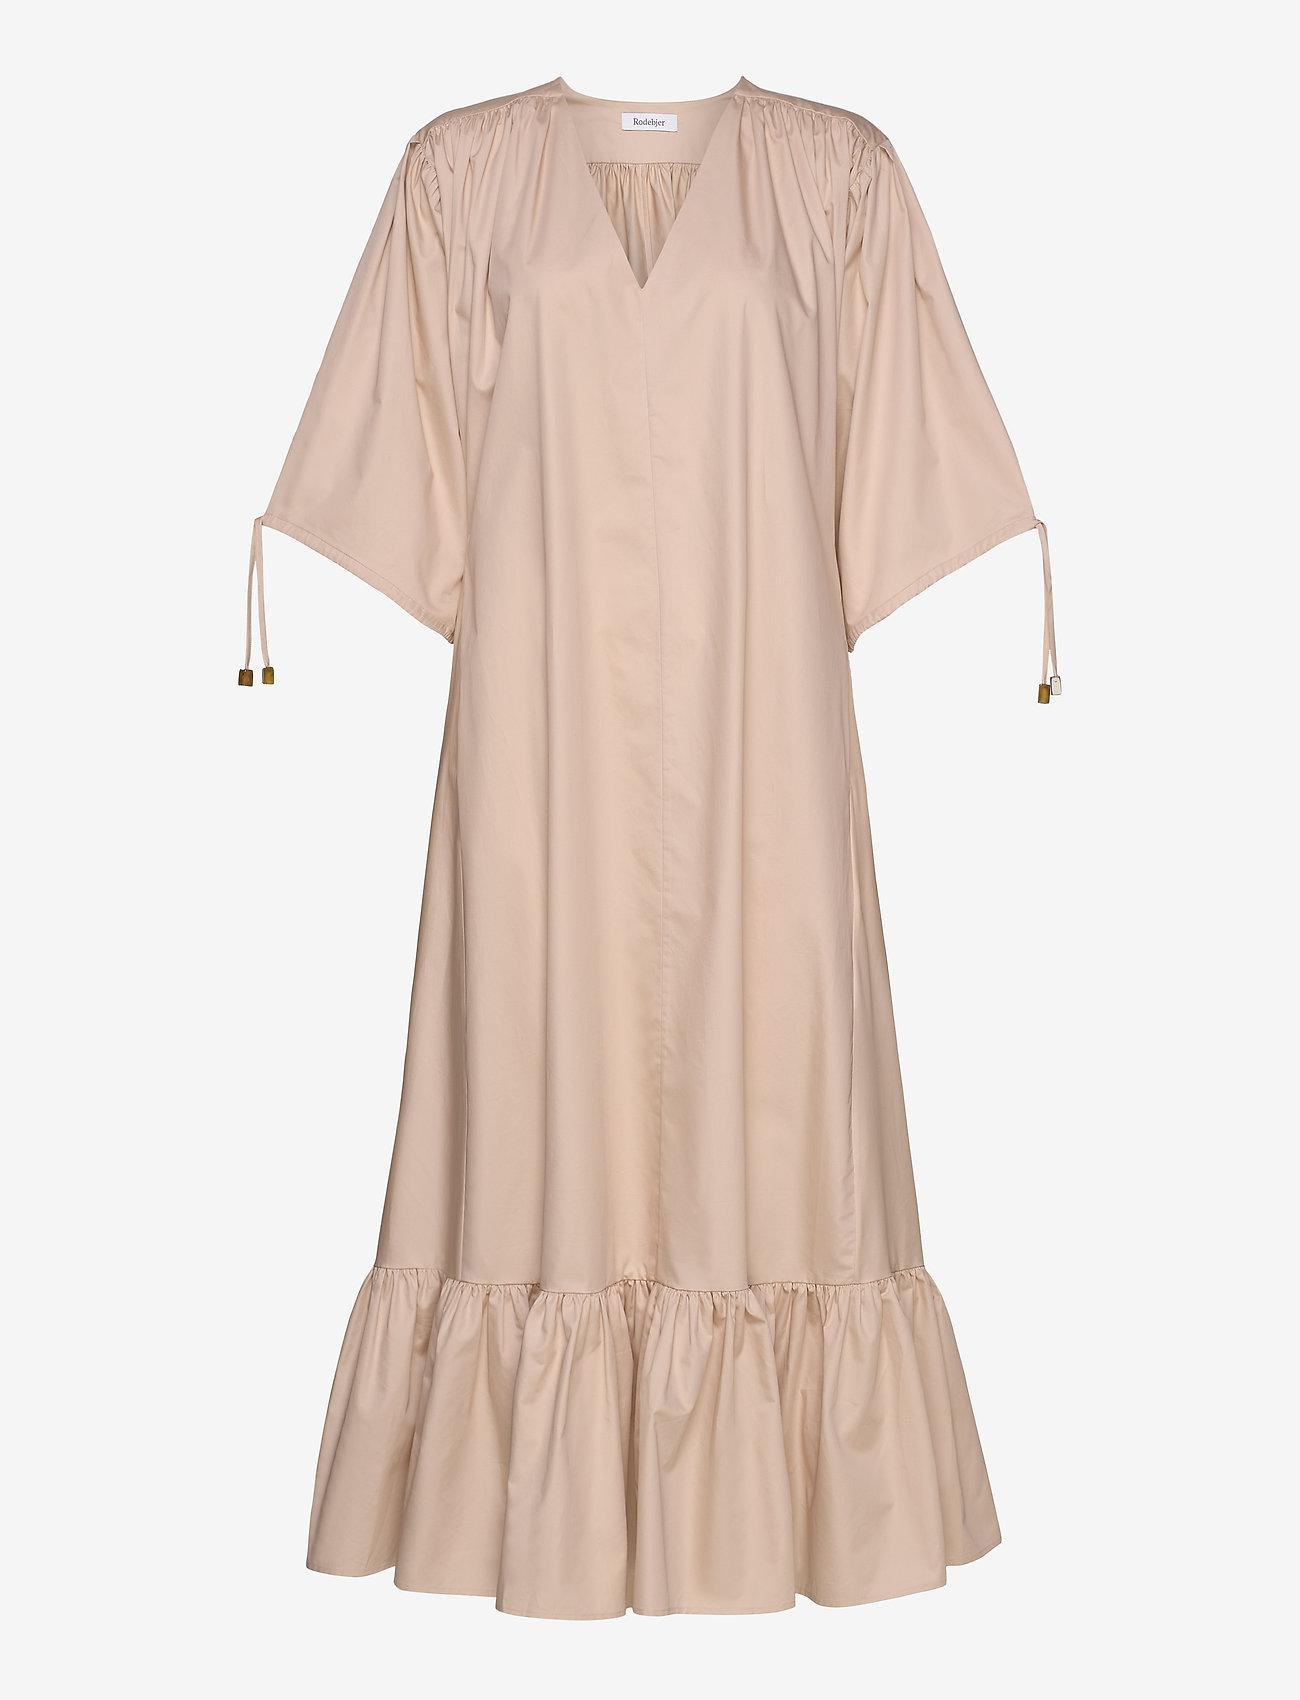 RODEBJER - RODEBJER DAKOTA - robes longues - whisper pink - 0